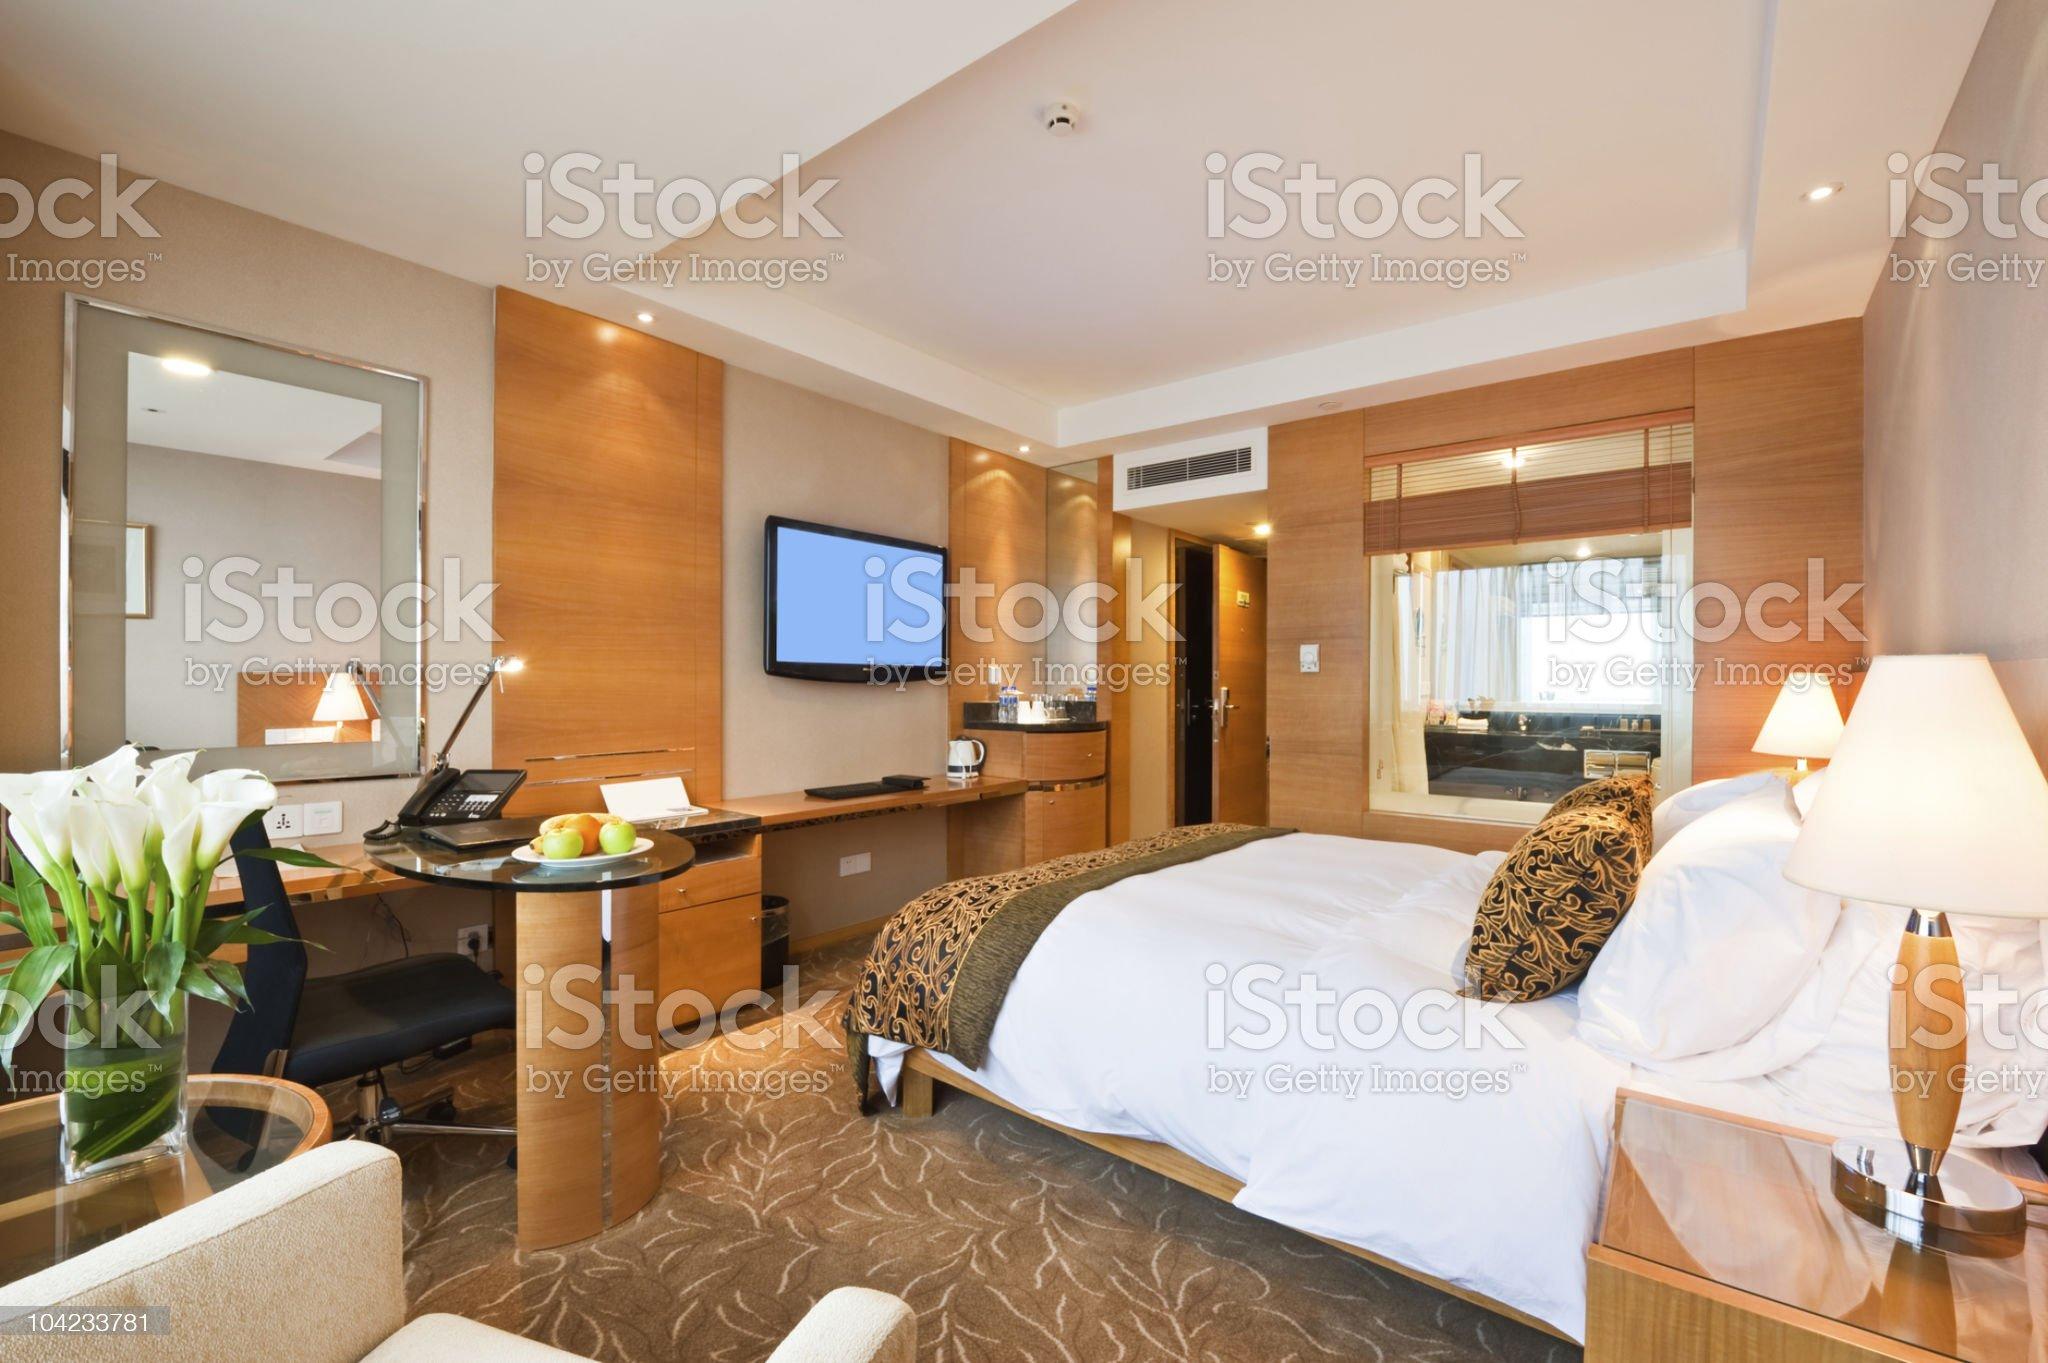 hotel room interior royalty-free stock photo